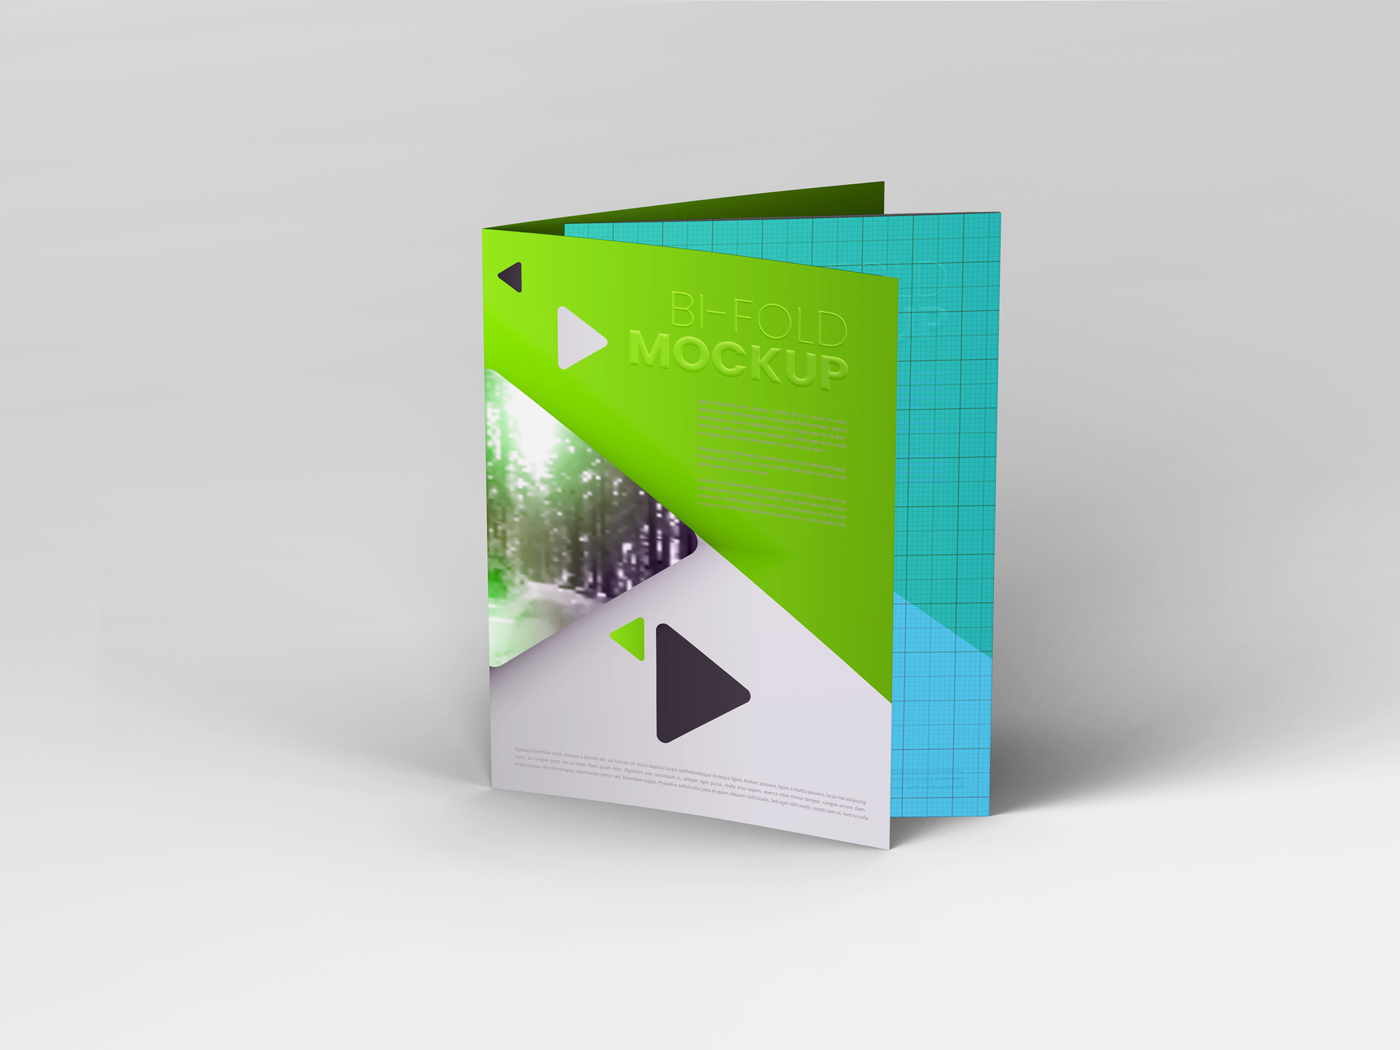 A4 Bifold Mockups V3 example image 20